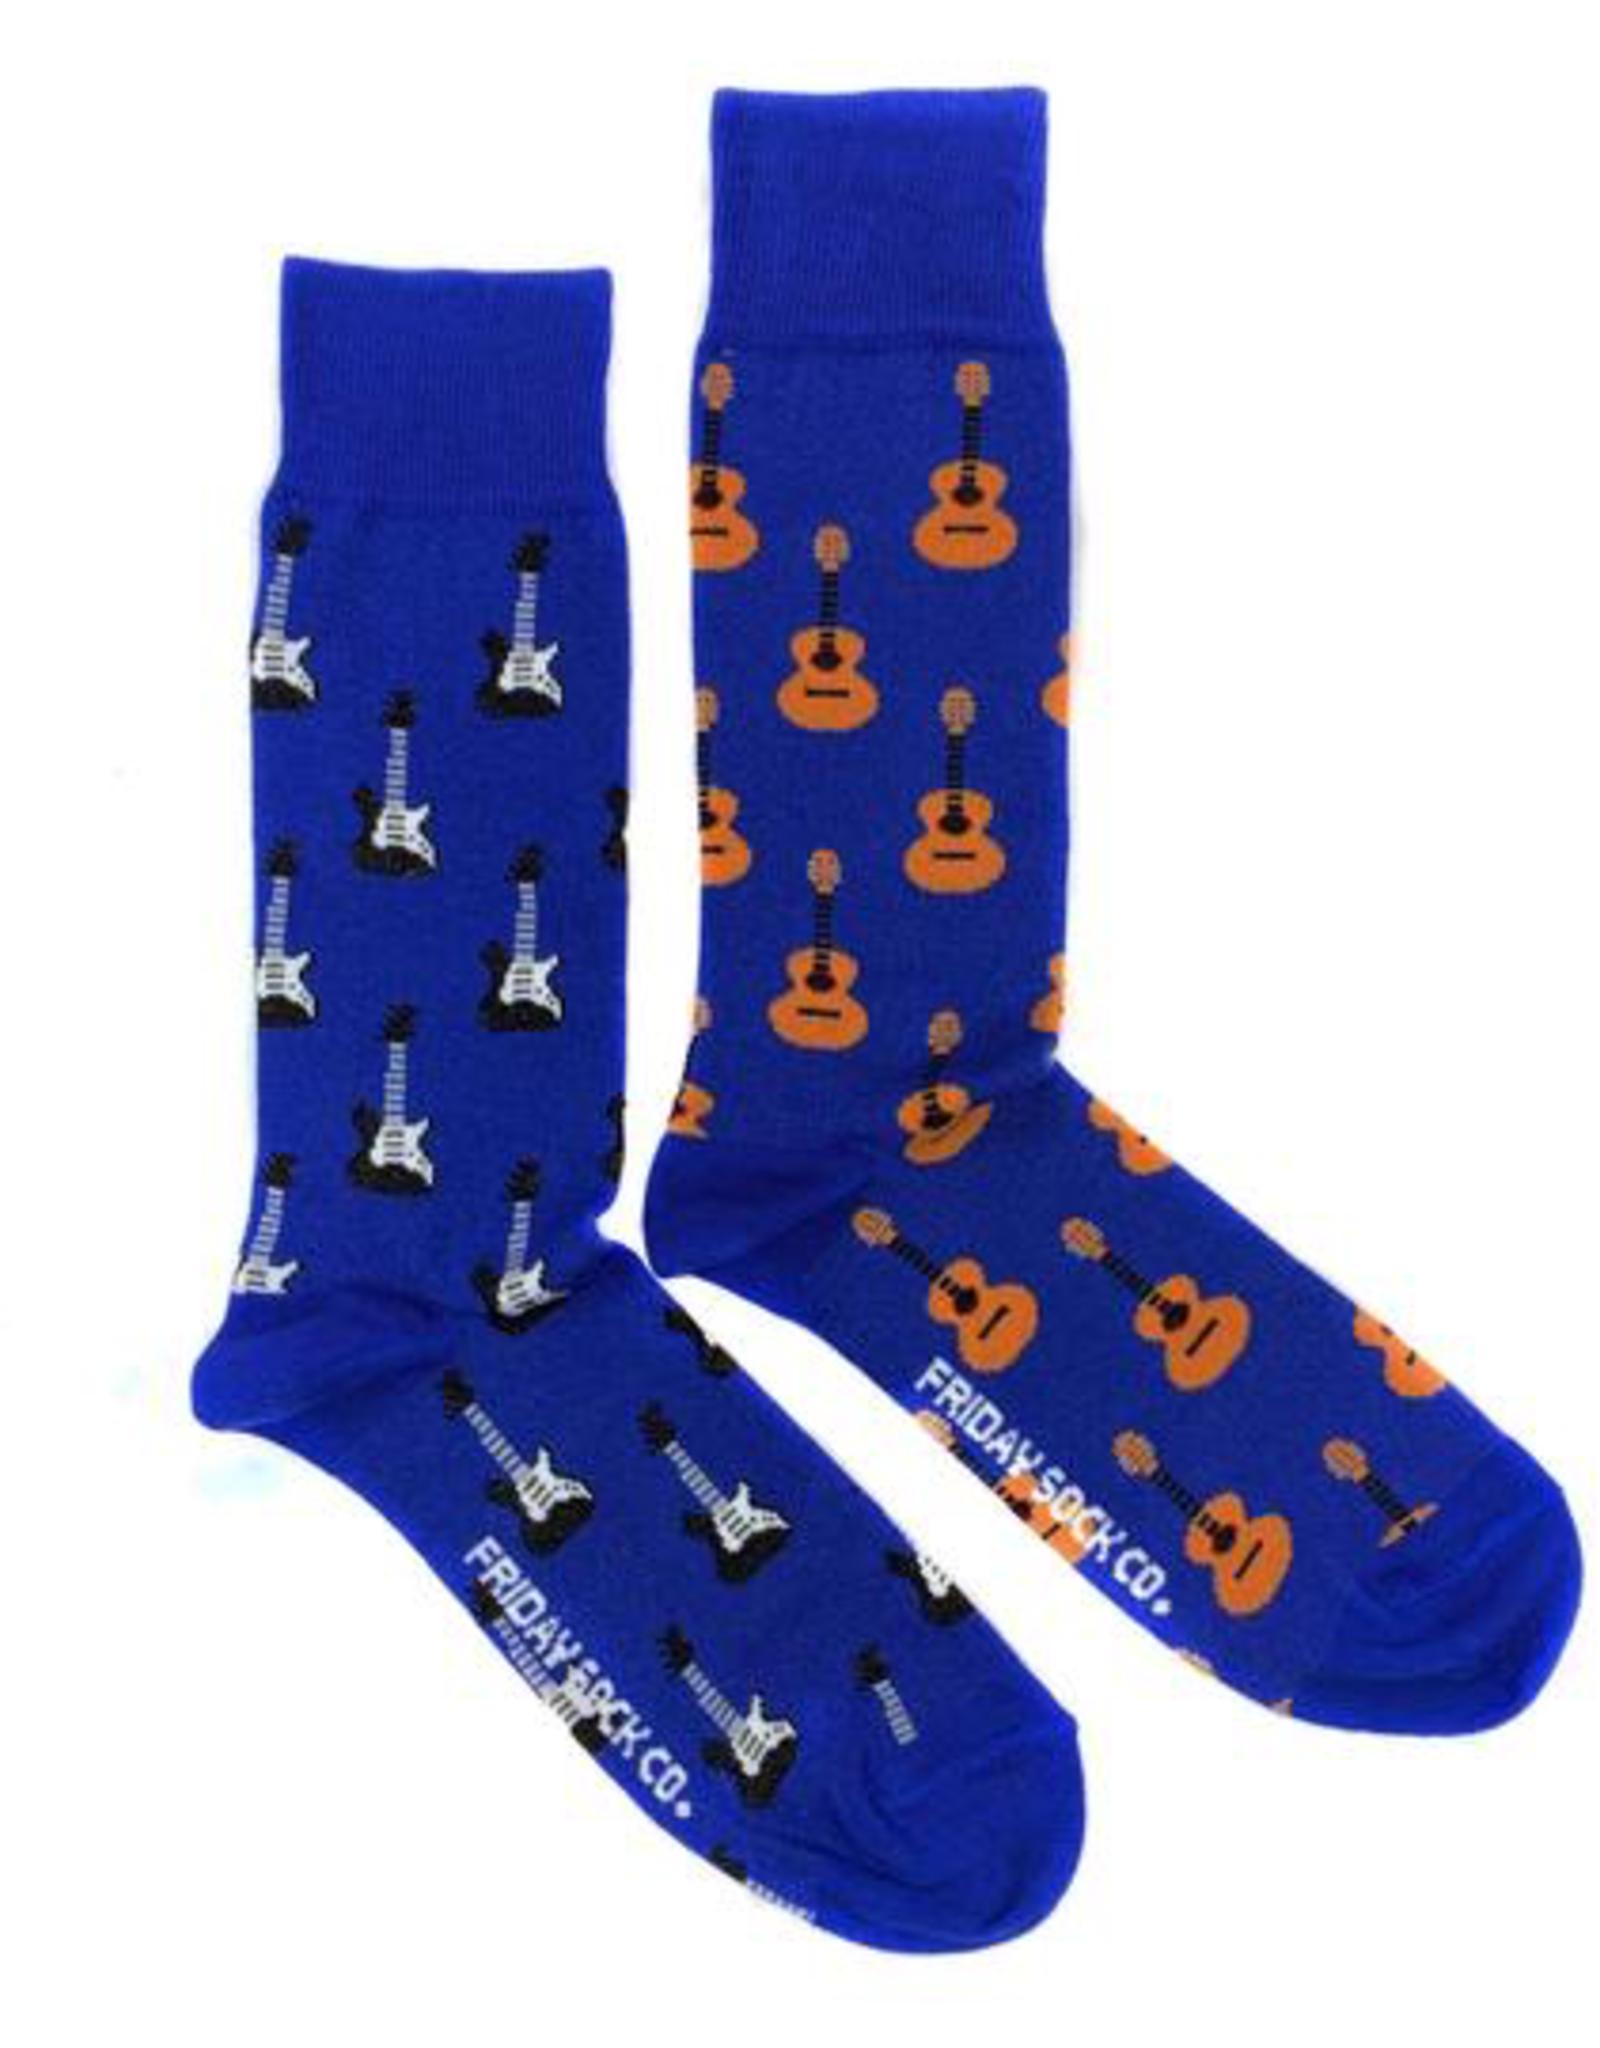 Friday Sock Co Friday Sock Co Guitar Socks